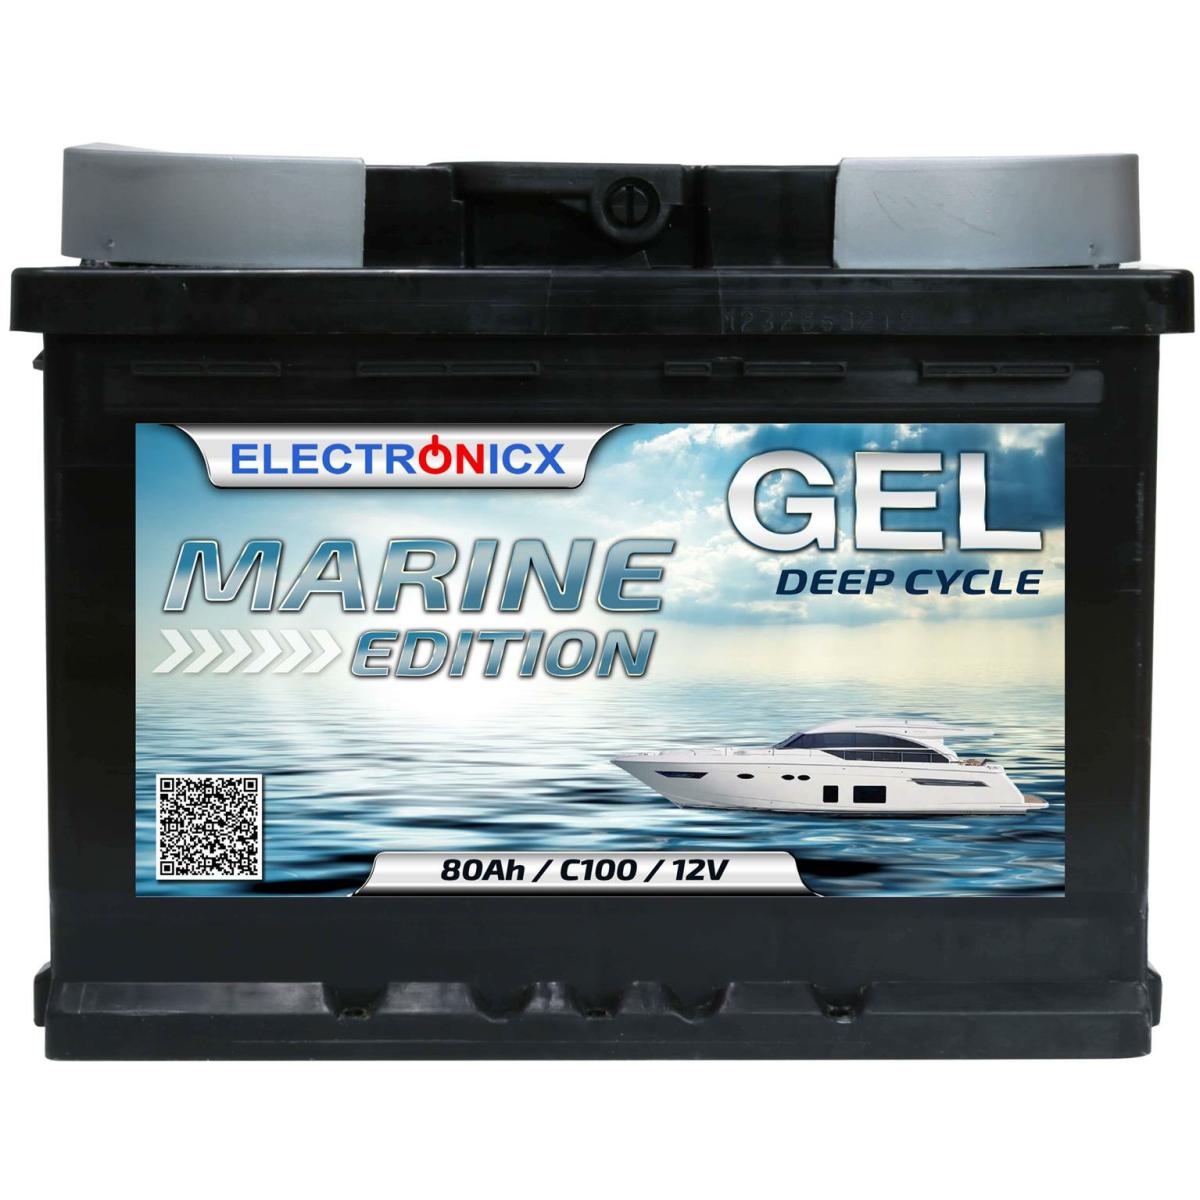 GEL Batterie 80AH Electronicx Marine Edition Boot Schiff Versorgungsbatterie 12V Akku Deep Bootsbatterie Autobatterie Solarbatterie Solar Batterien…